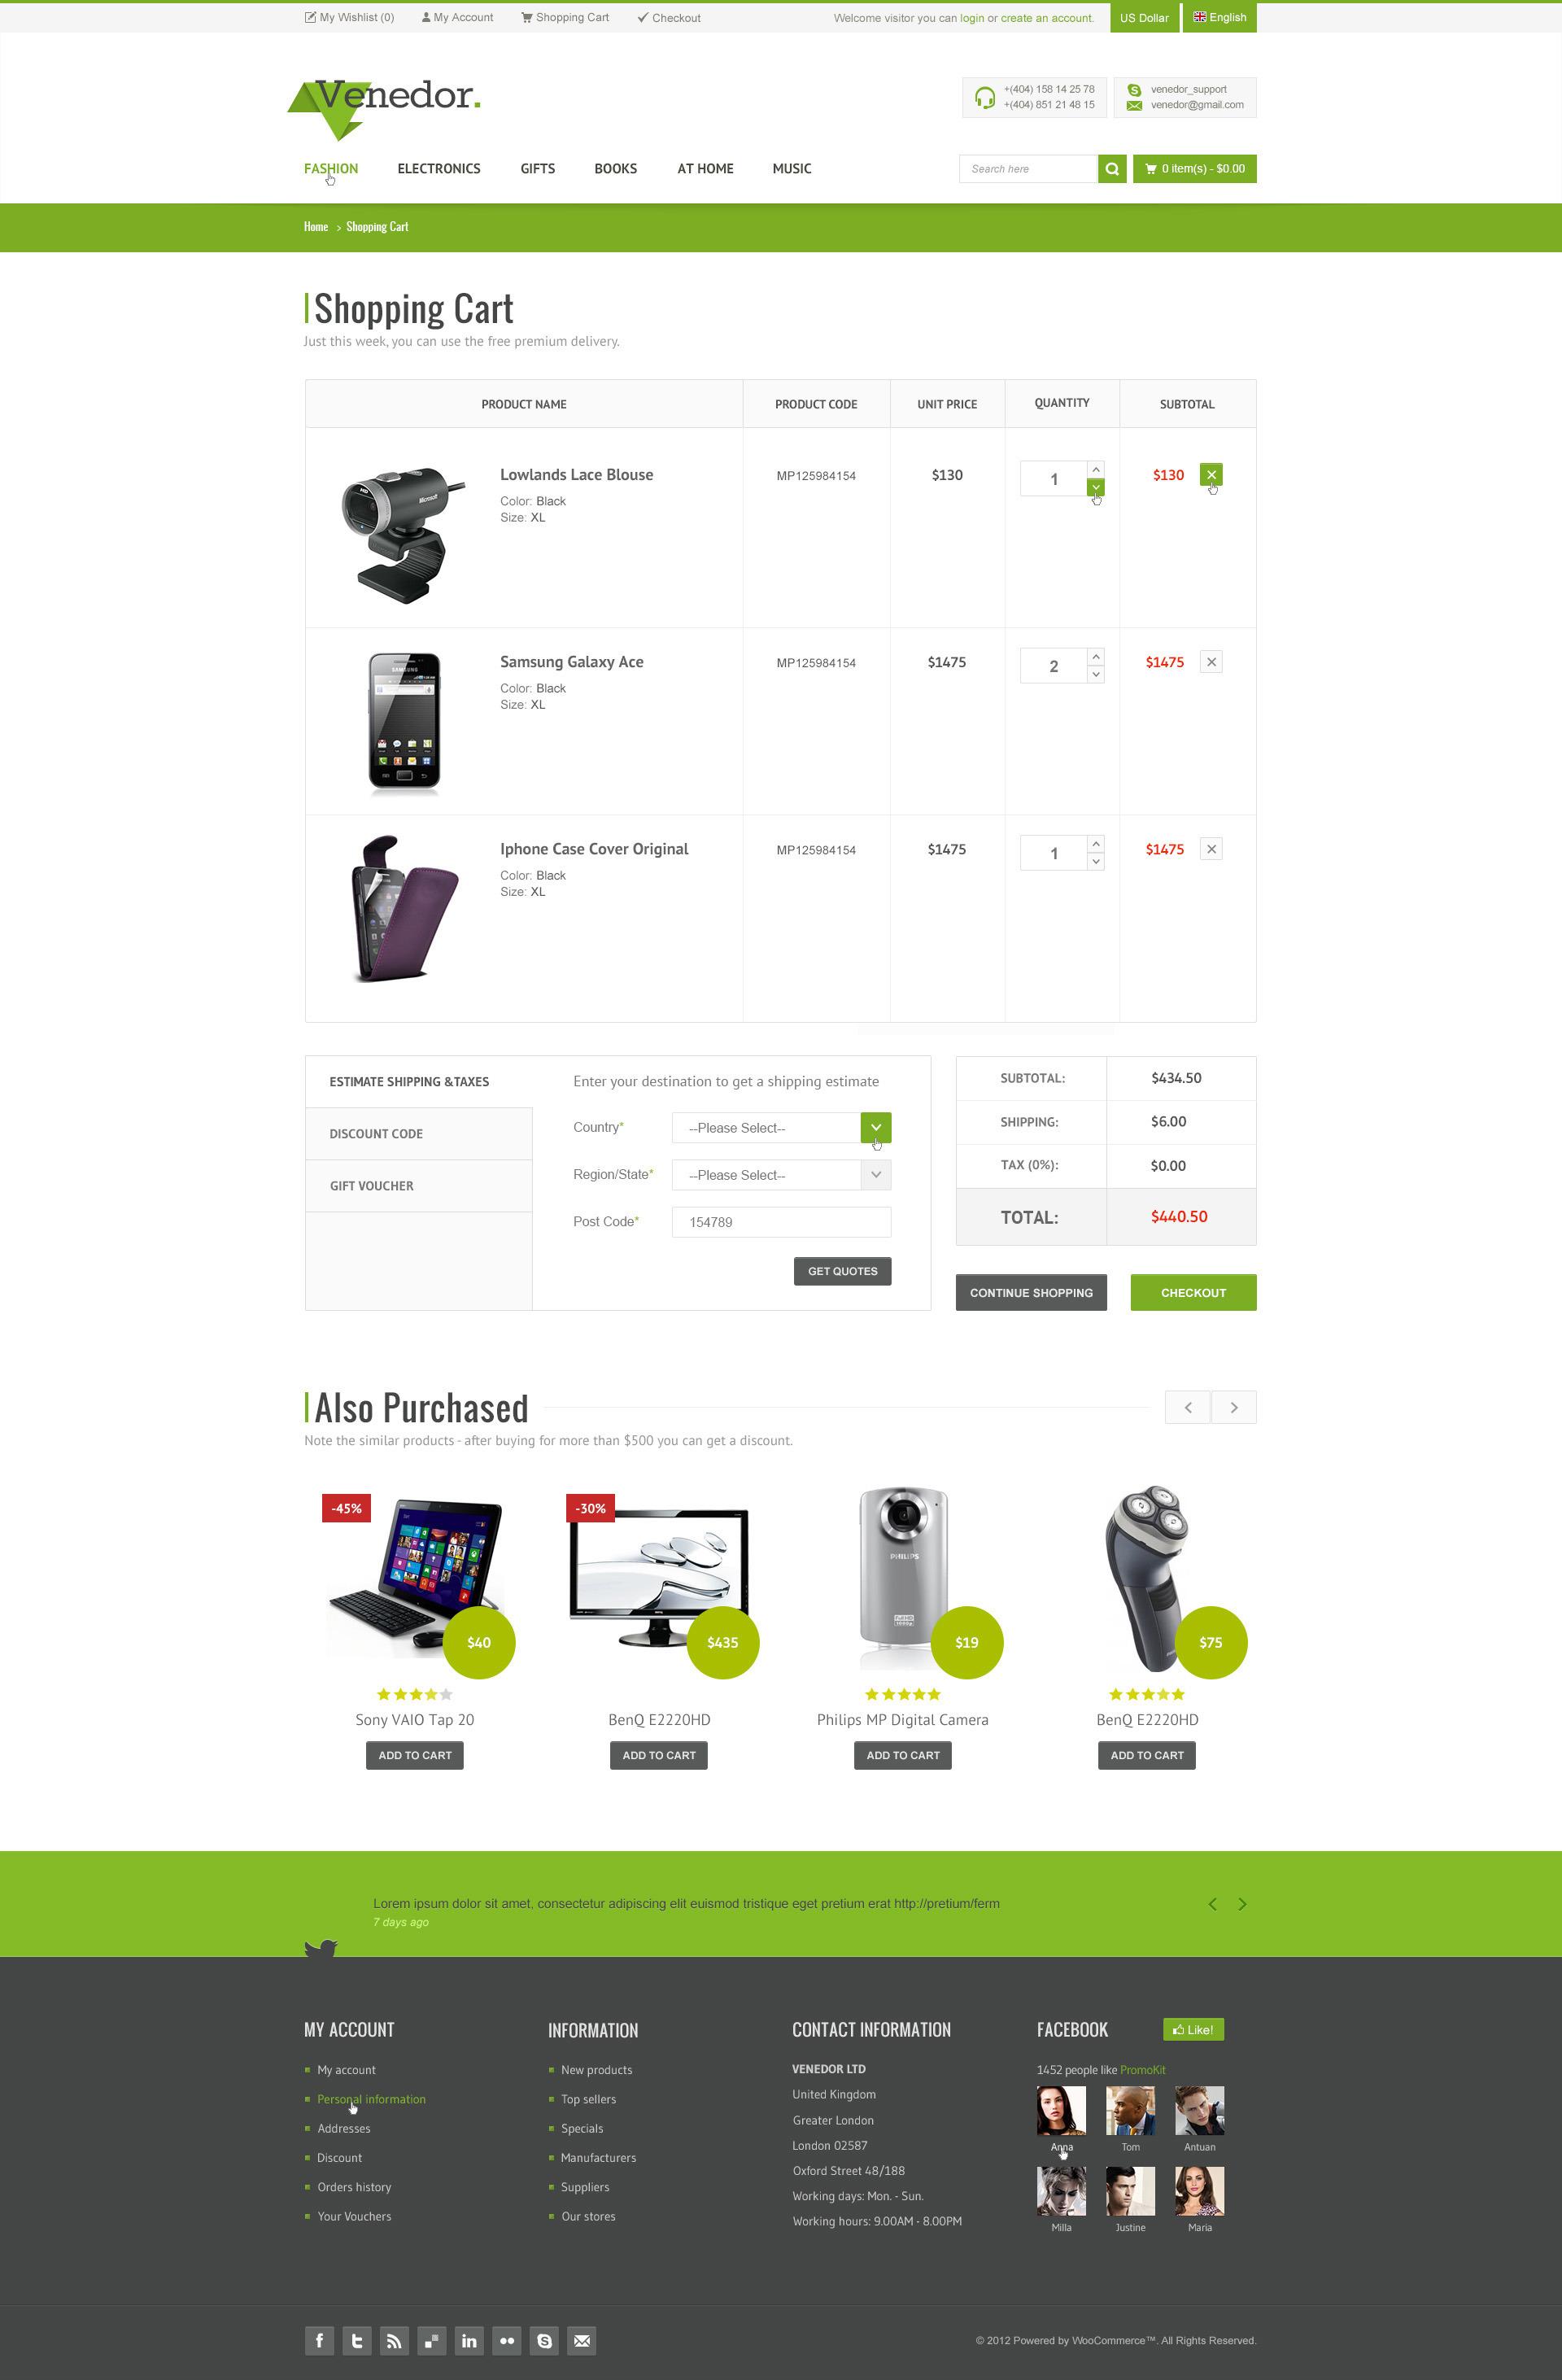 venedor bootstrap responsive ecommerce psd by marekmnishek themeforest. Black Bedroom Furniture Sets. Home Design Ideas